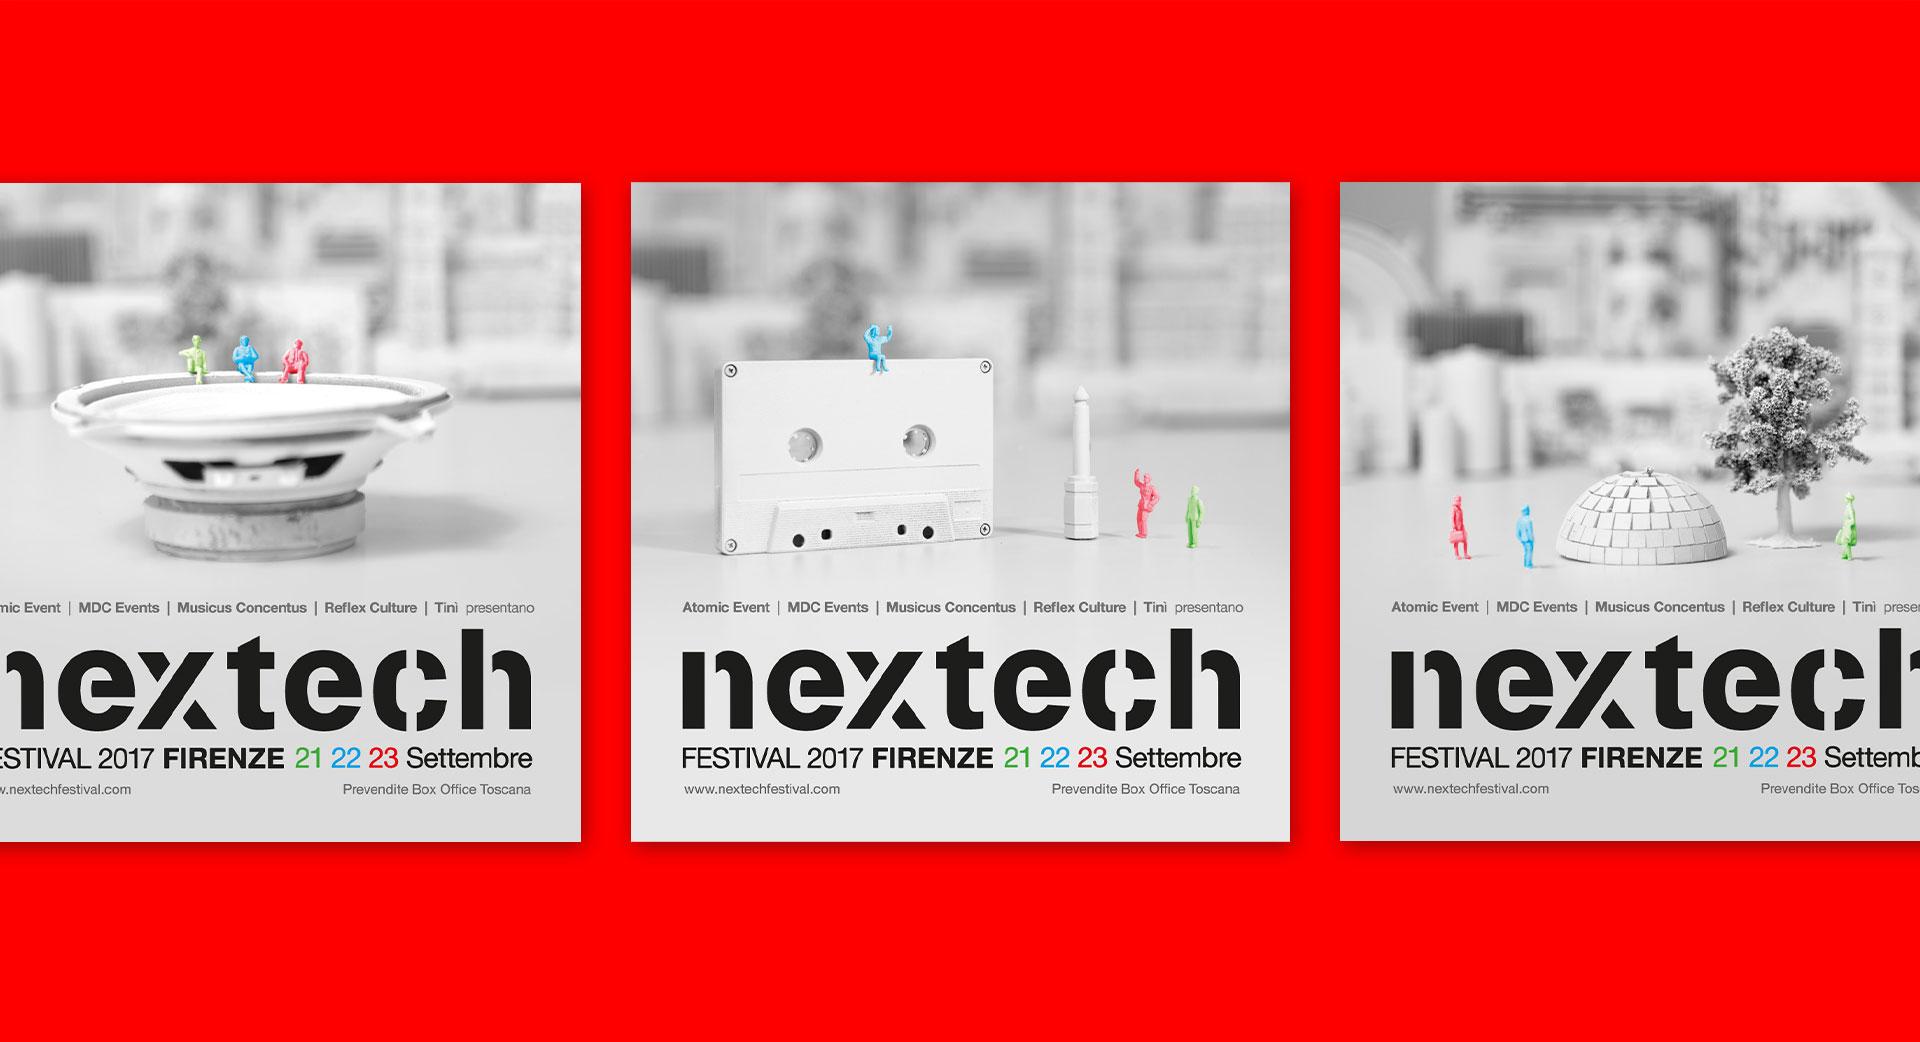 Nextech-Festival-2017-previews